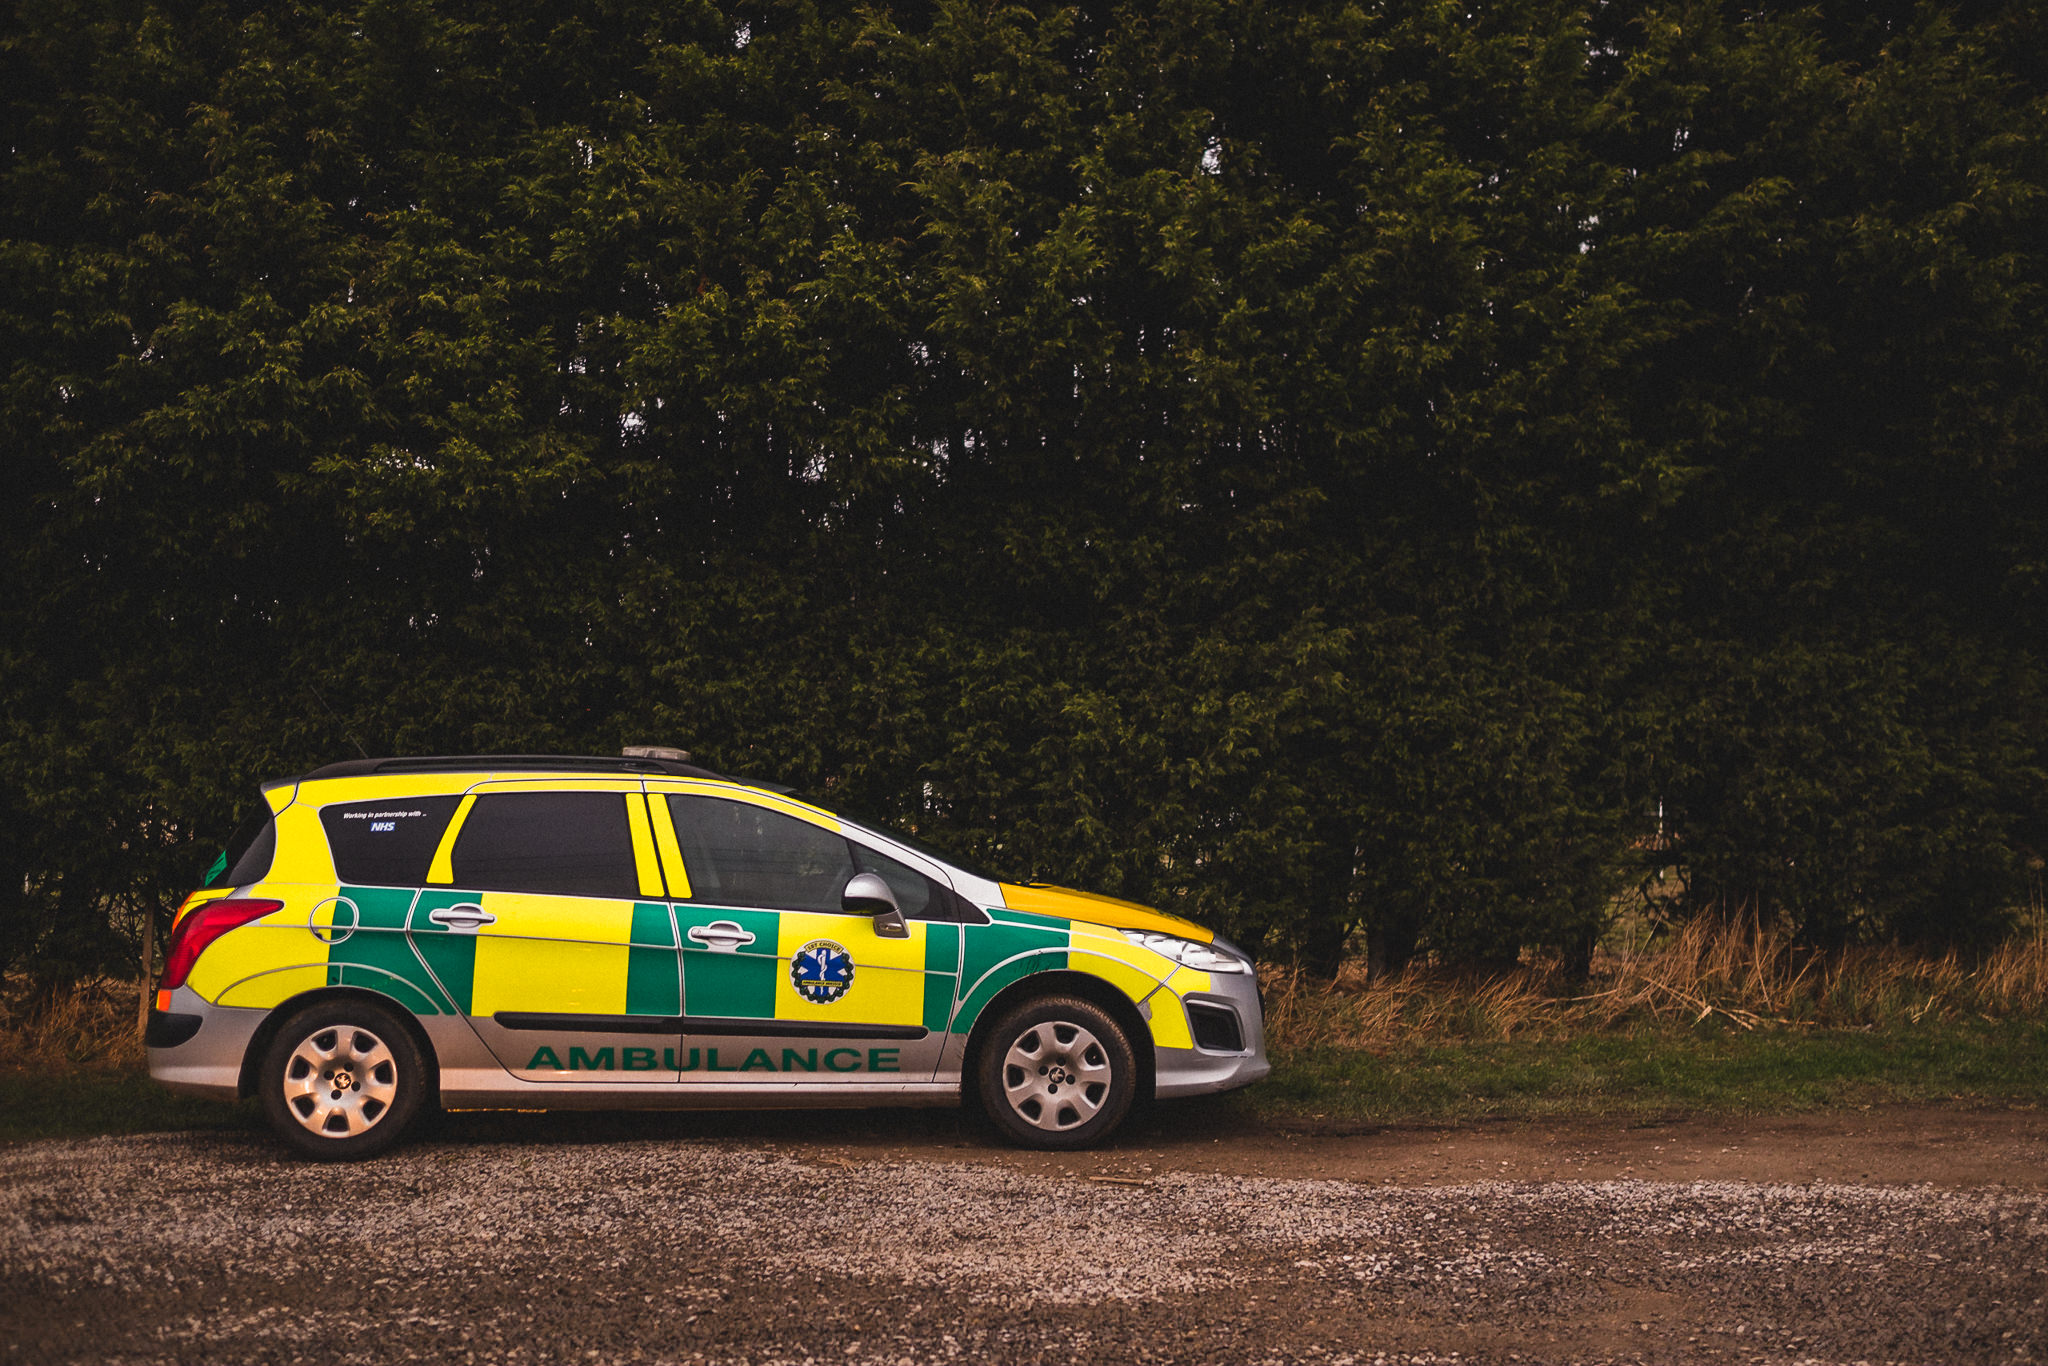 Ambulance arrives at inflatable assault course at wedding reception Leeds, Hillam